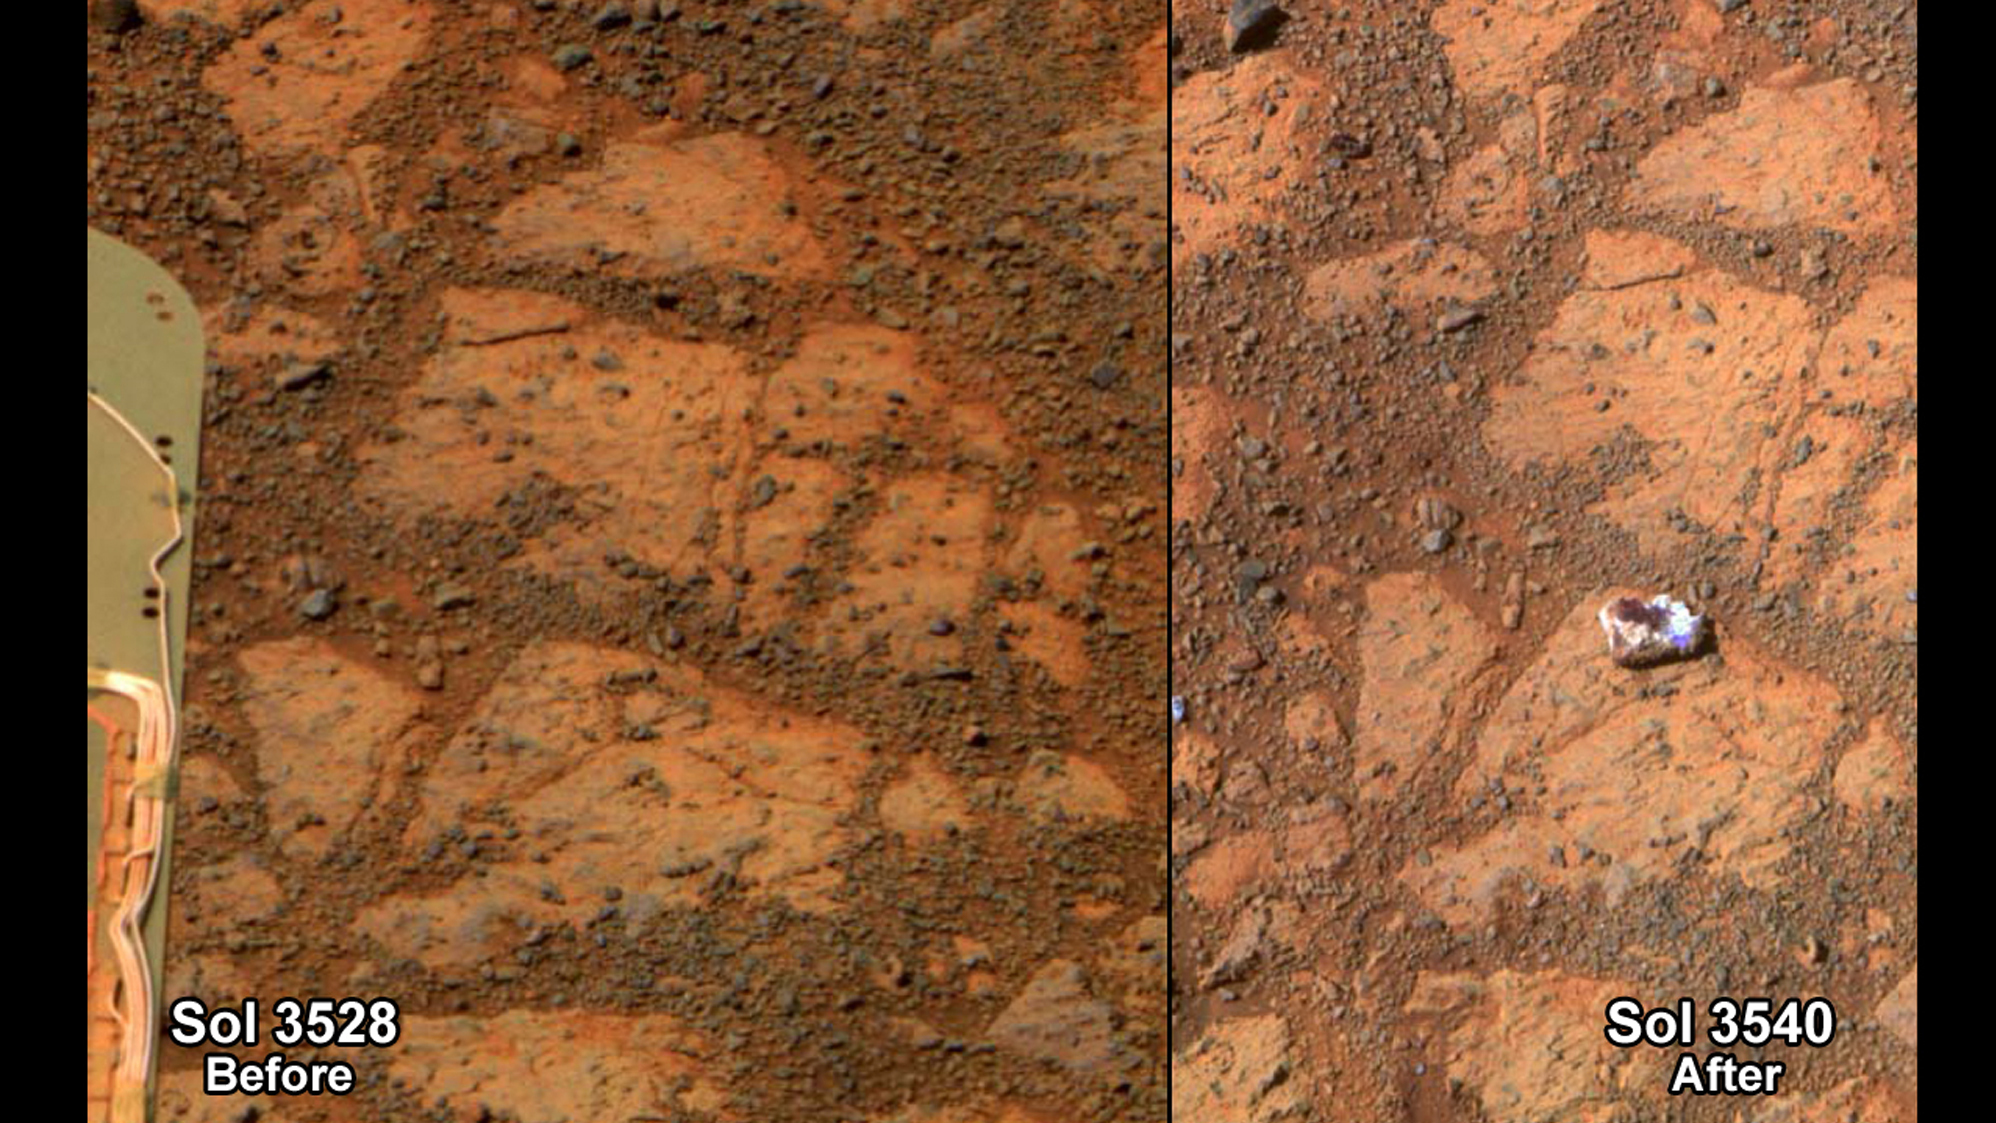 Mars 'Jelly Doughnut' Mystery Solved: It's Just A Rock, NASA Says